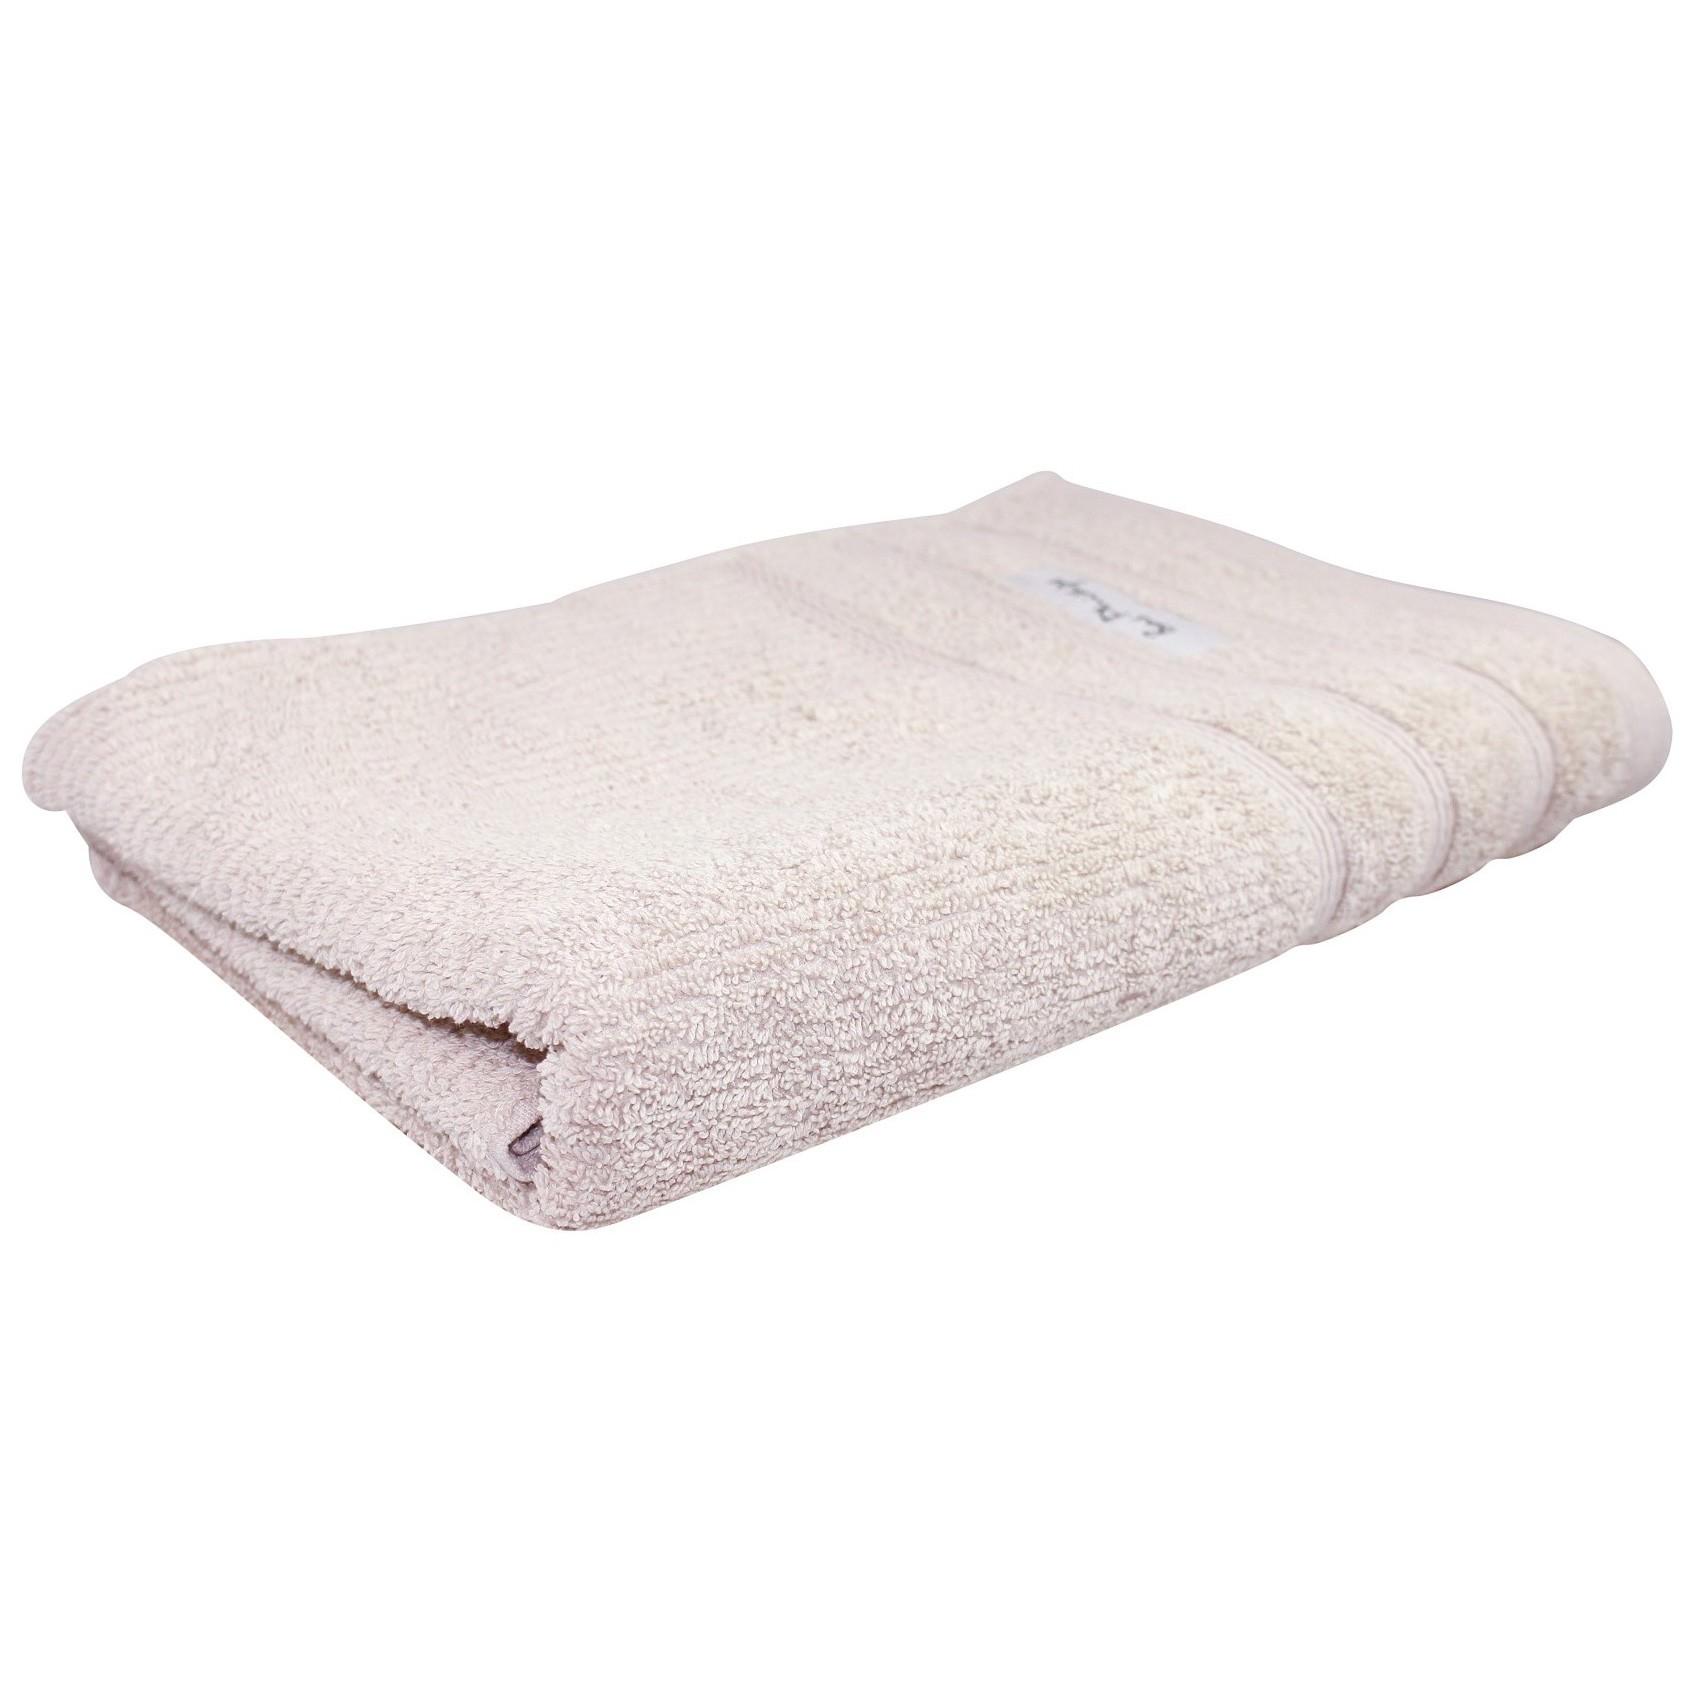 Bas Phillips Cairo Egyptian Cotton Bath Towel, Desert